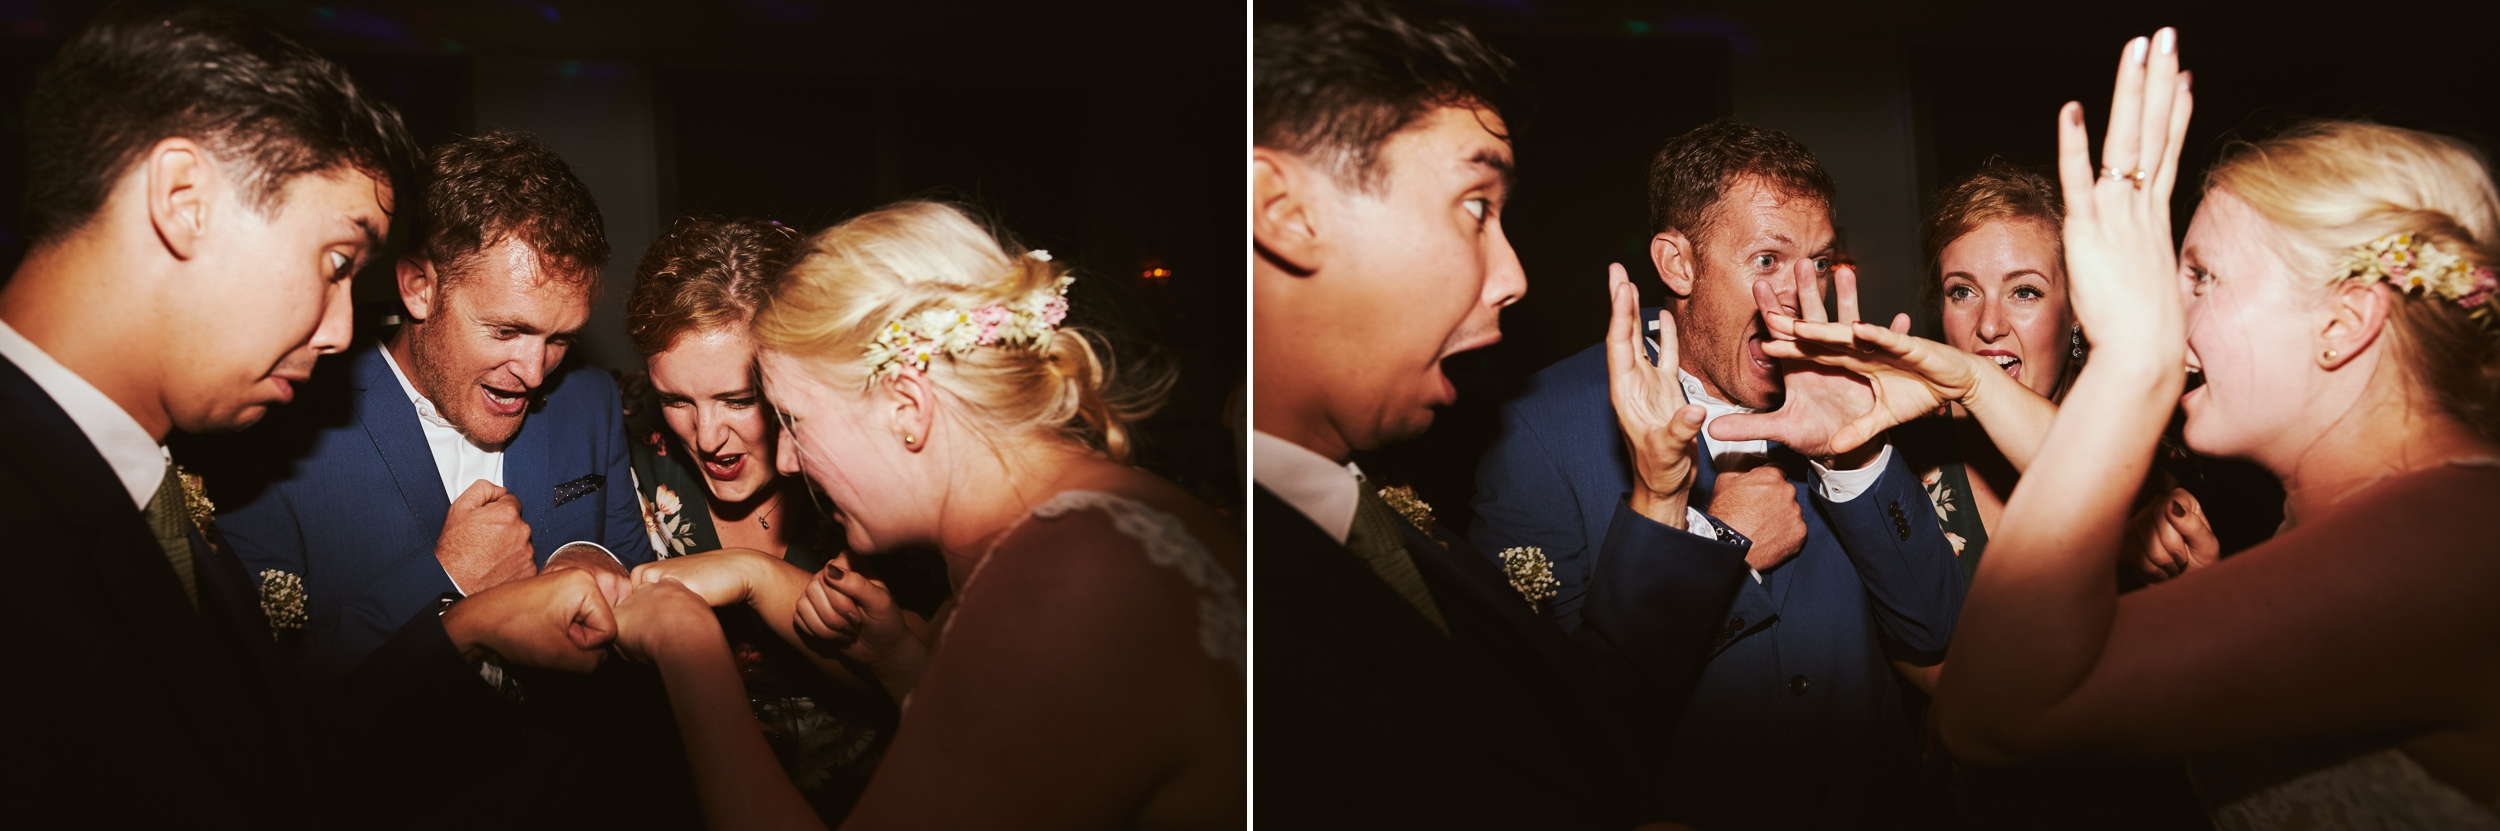 Wedding in London - Echoes & Wild Hearts 0071.jpg